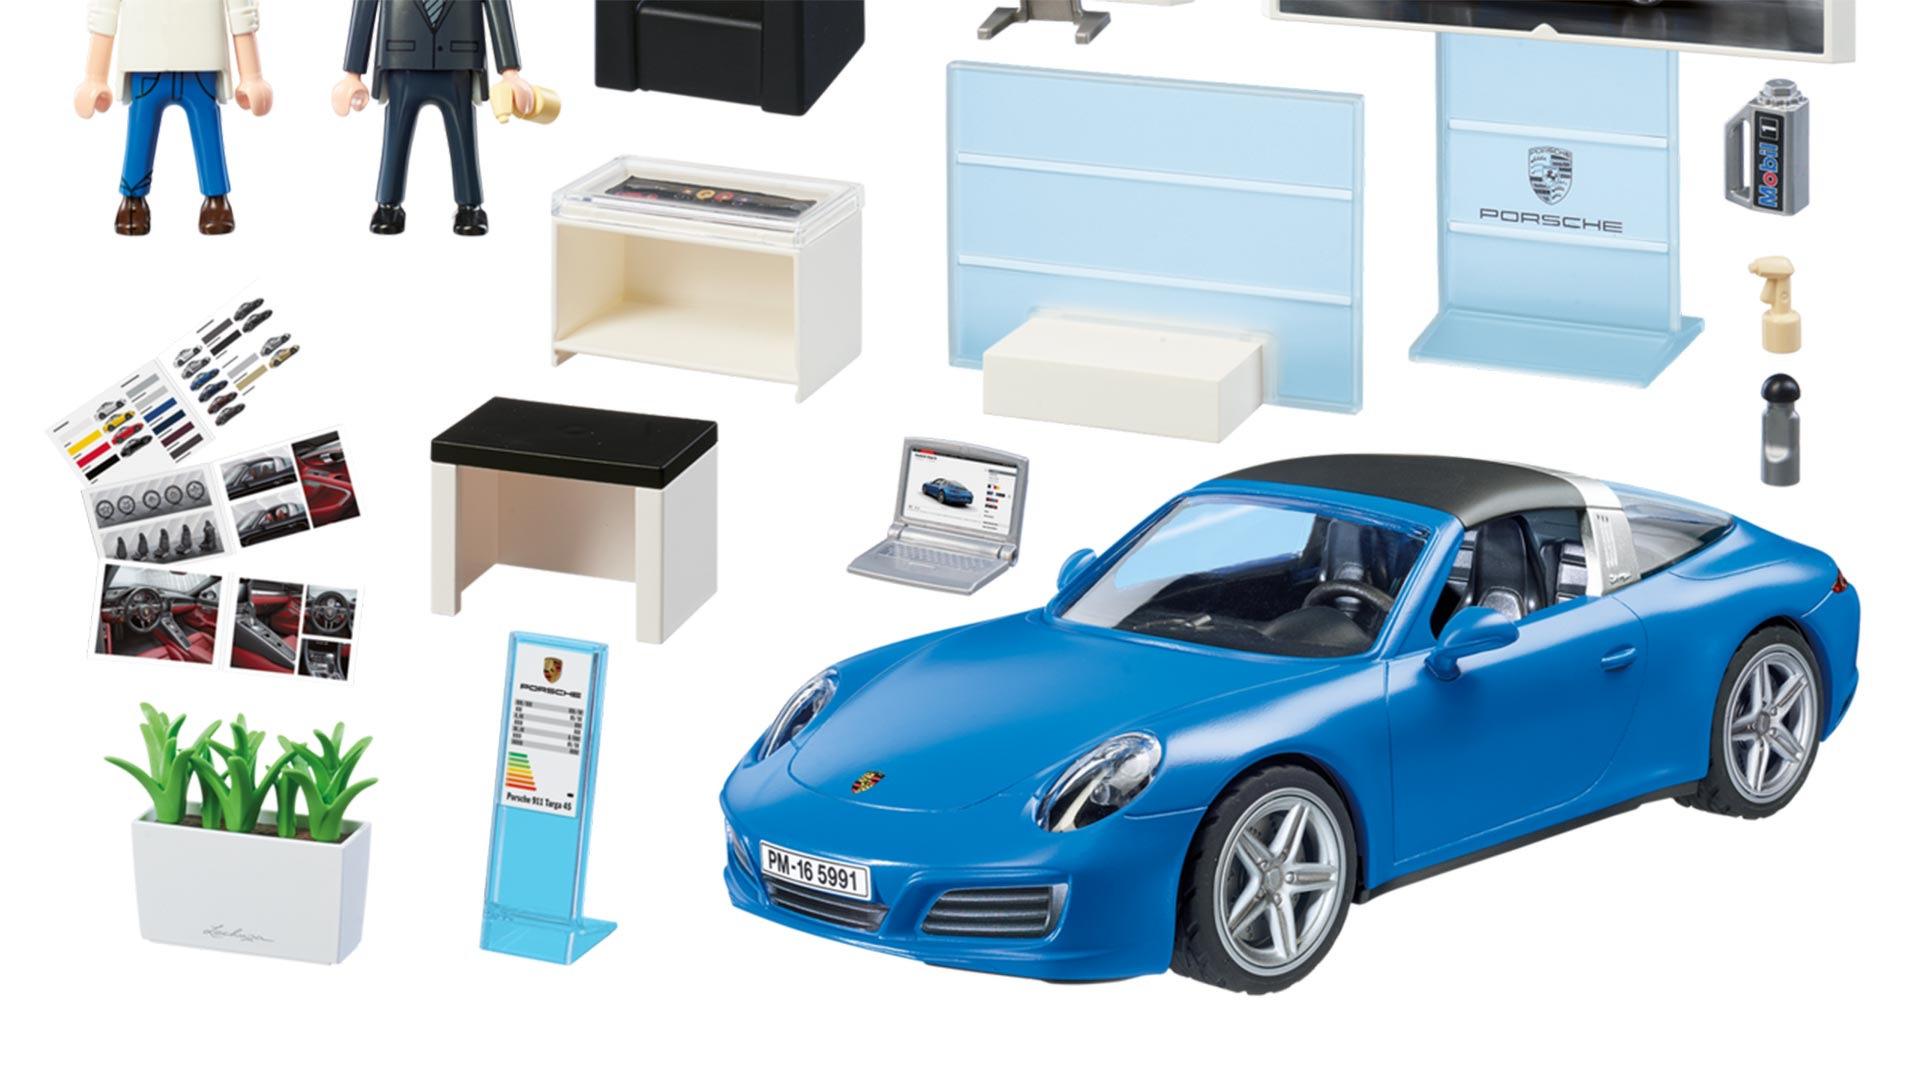 playmobil-porsche-911-targa-4s (5)